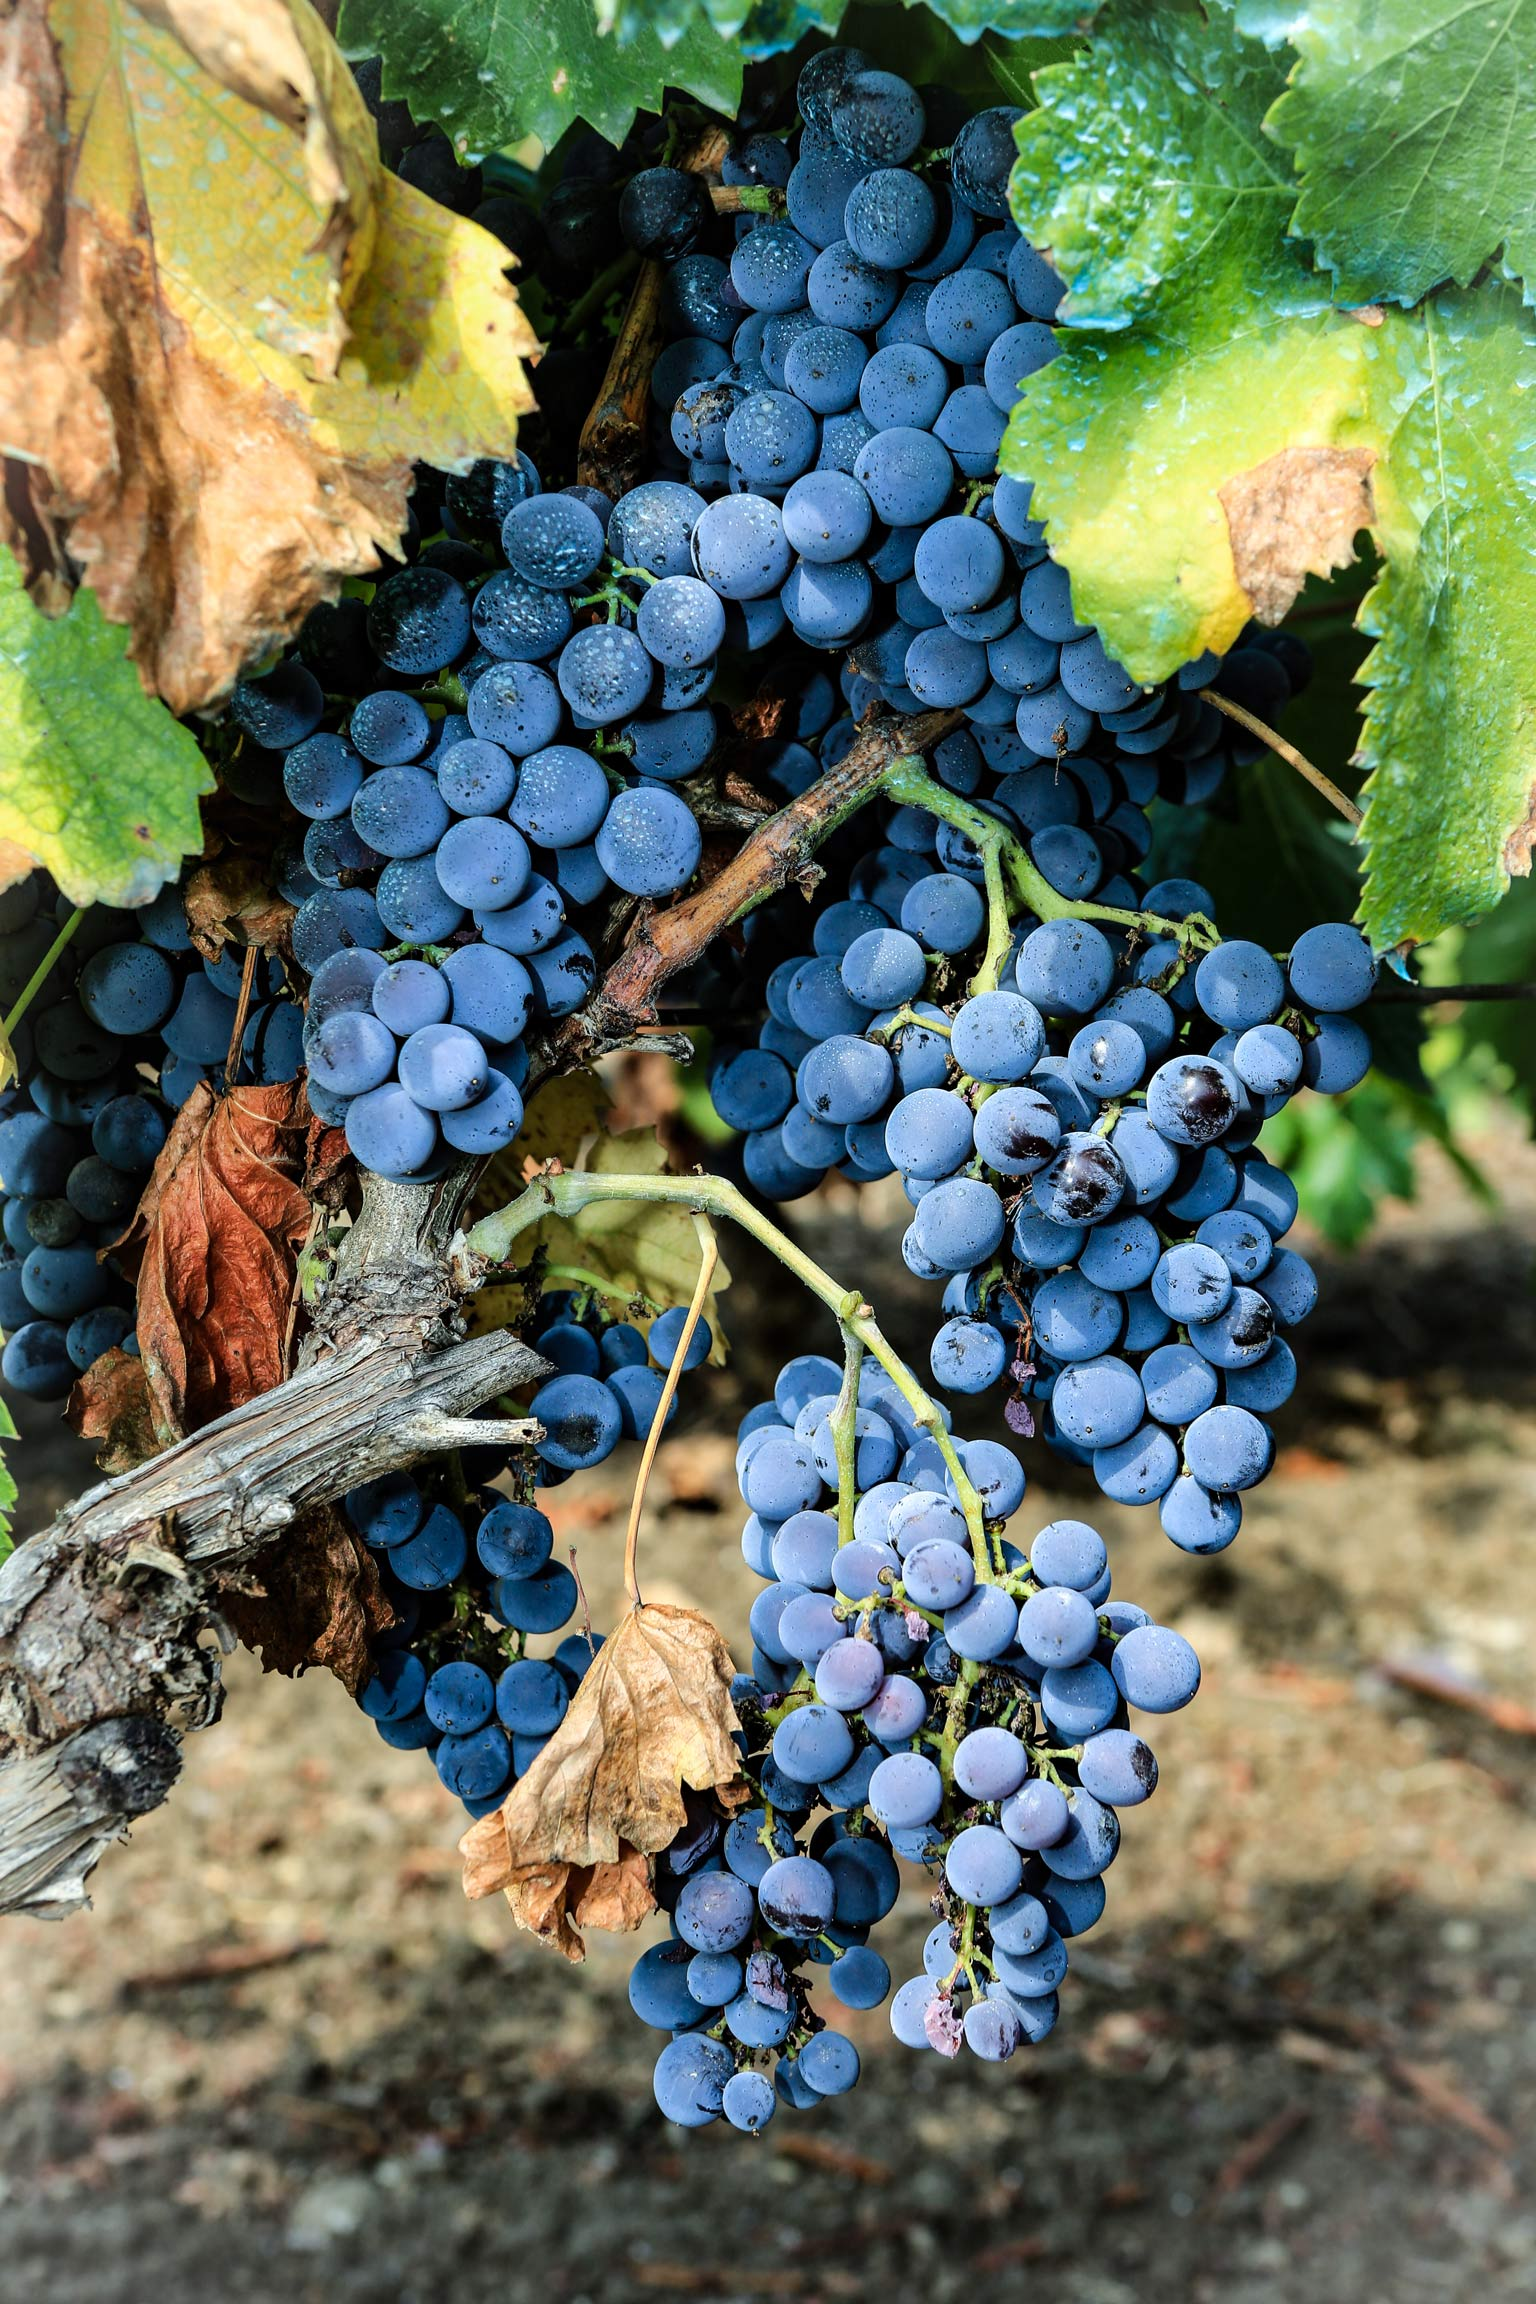 uva rossa, Vigneti a Sorgono in Sardegna - Cantina del Mandrolisai